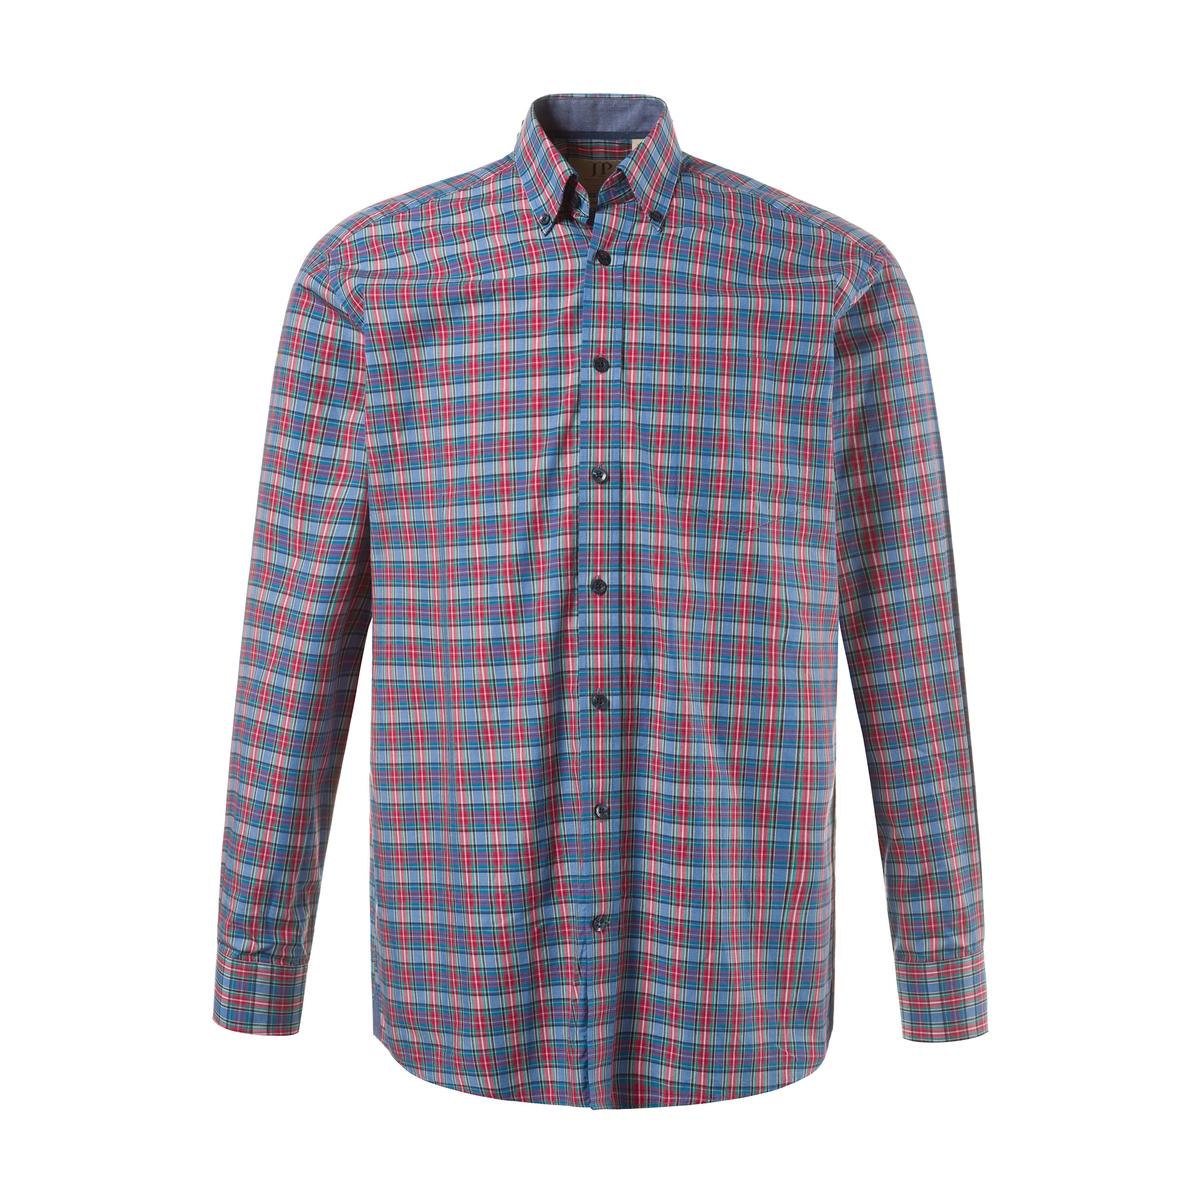 Рубашка<br><br>Цвет: в клетку<br>Размер: 7XL.6XL.5XL.4XL.L